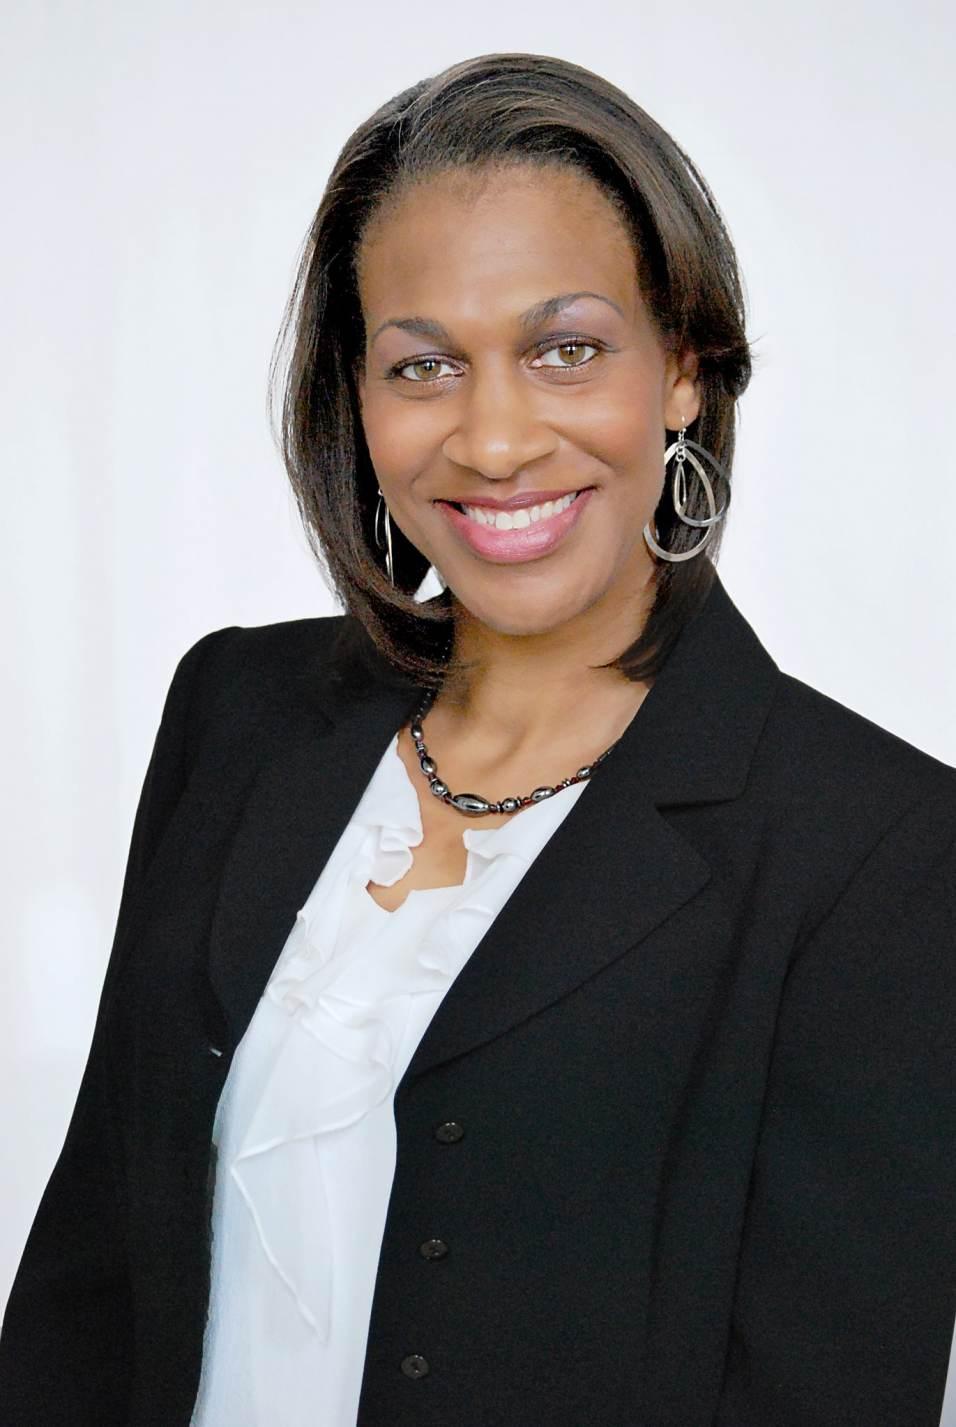 Crystal Porter, PH.D, ManeInsights.com, Healthy Hair System